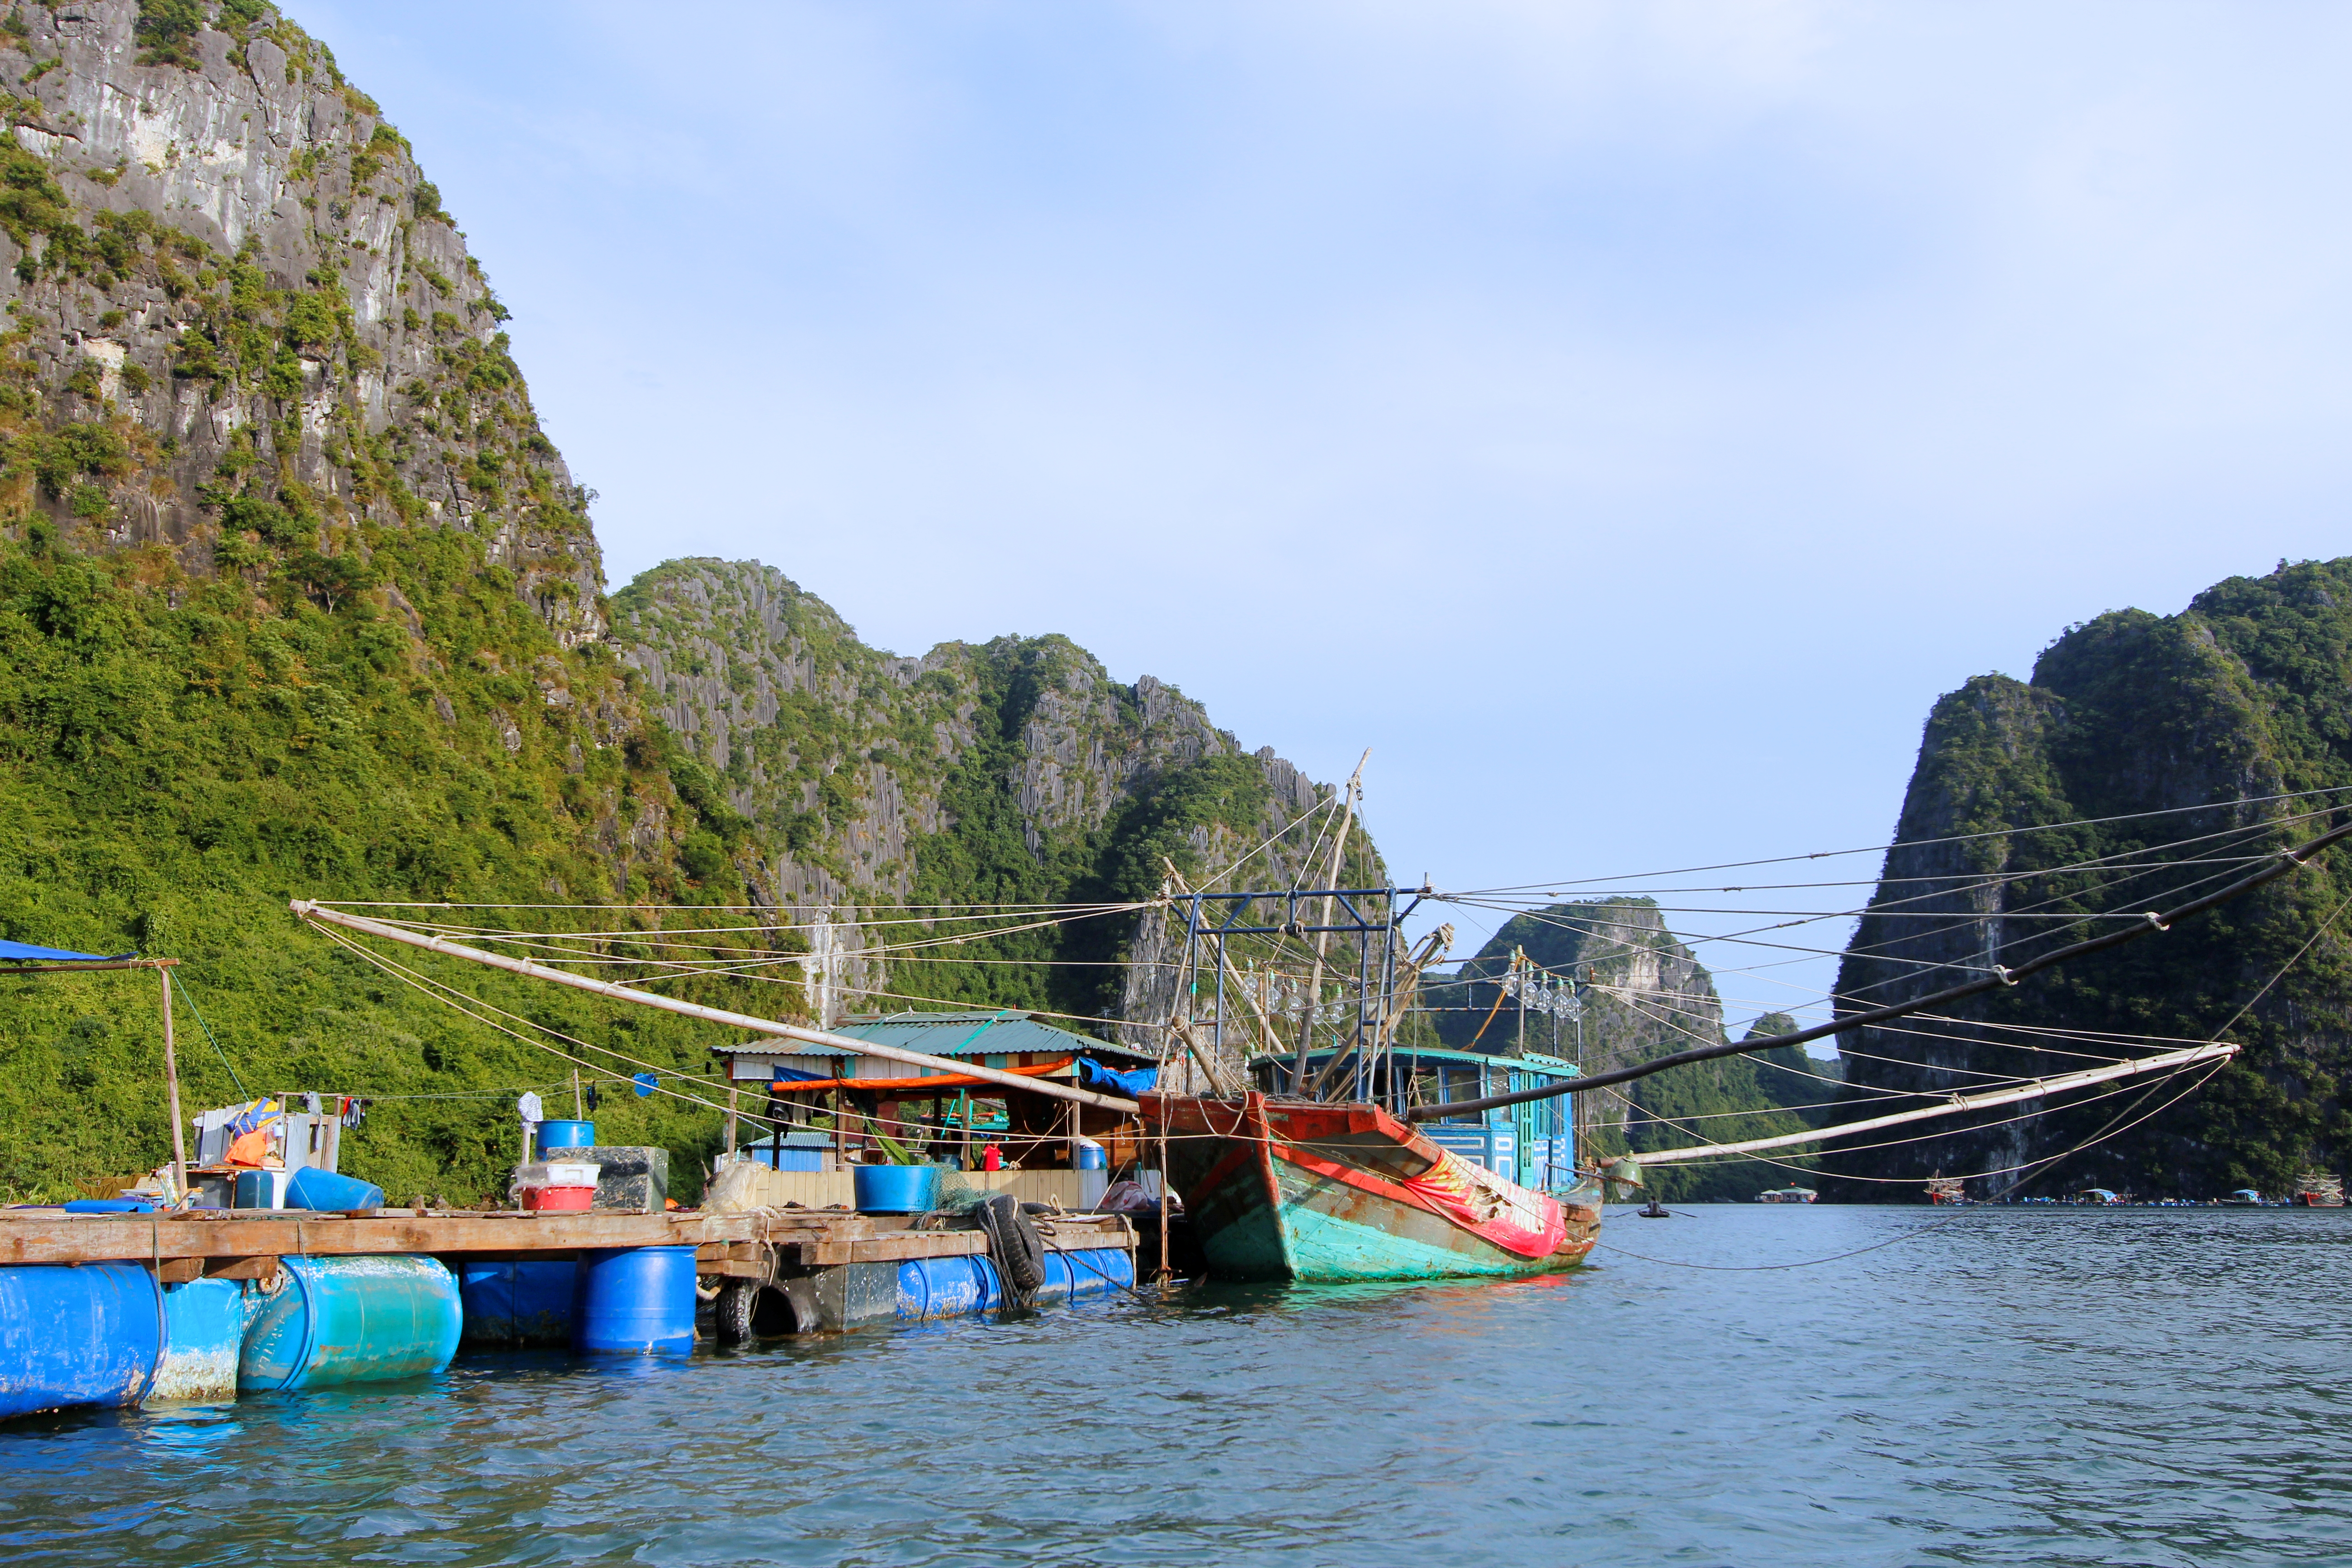 cua_van_fishing_village_1